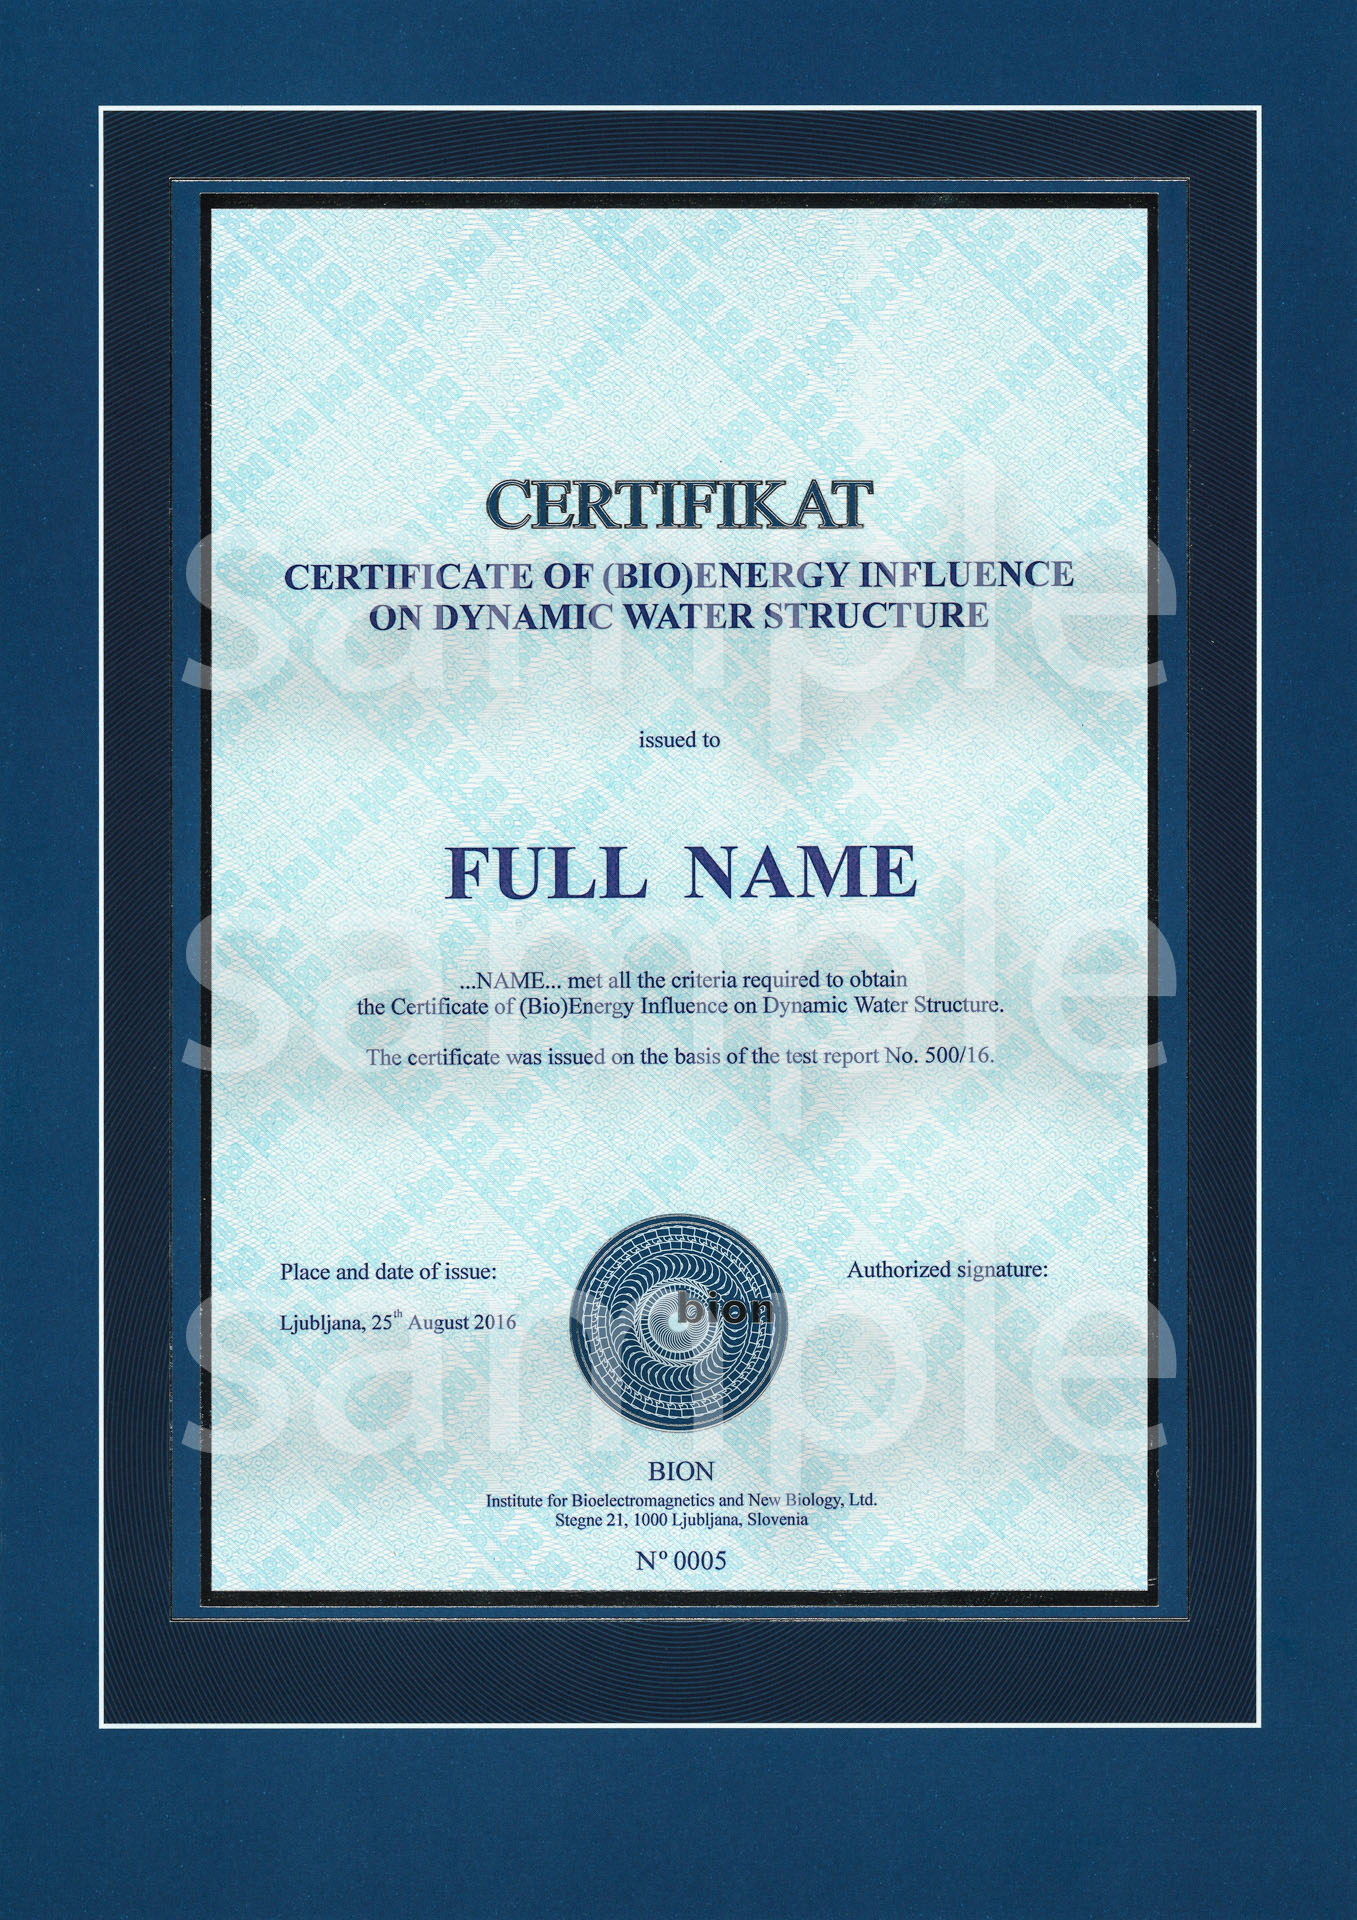 bion_institute-certifikat_of_bioenergy_influence_on_water